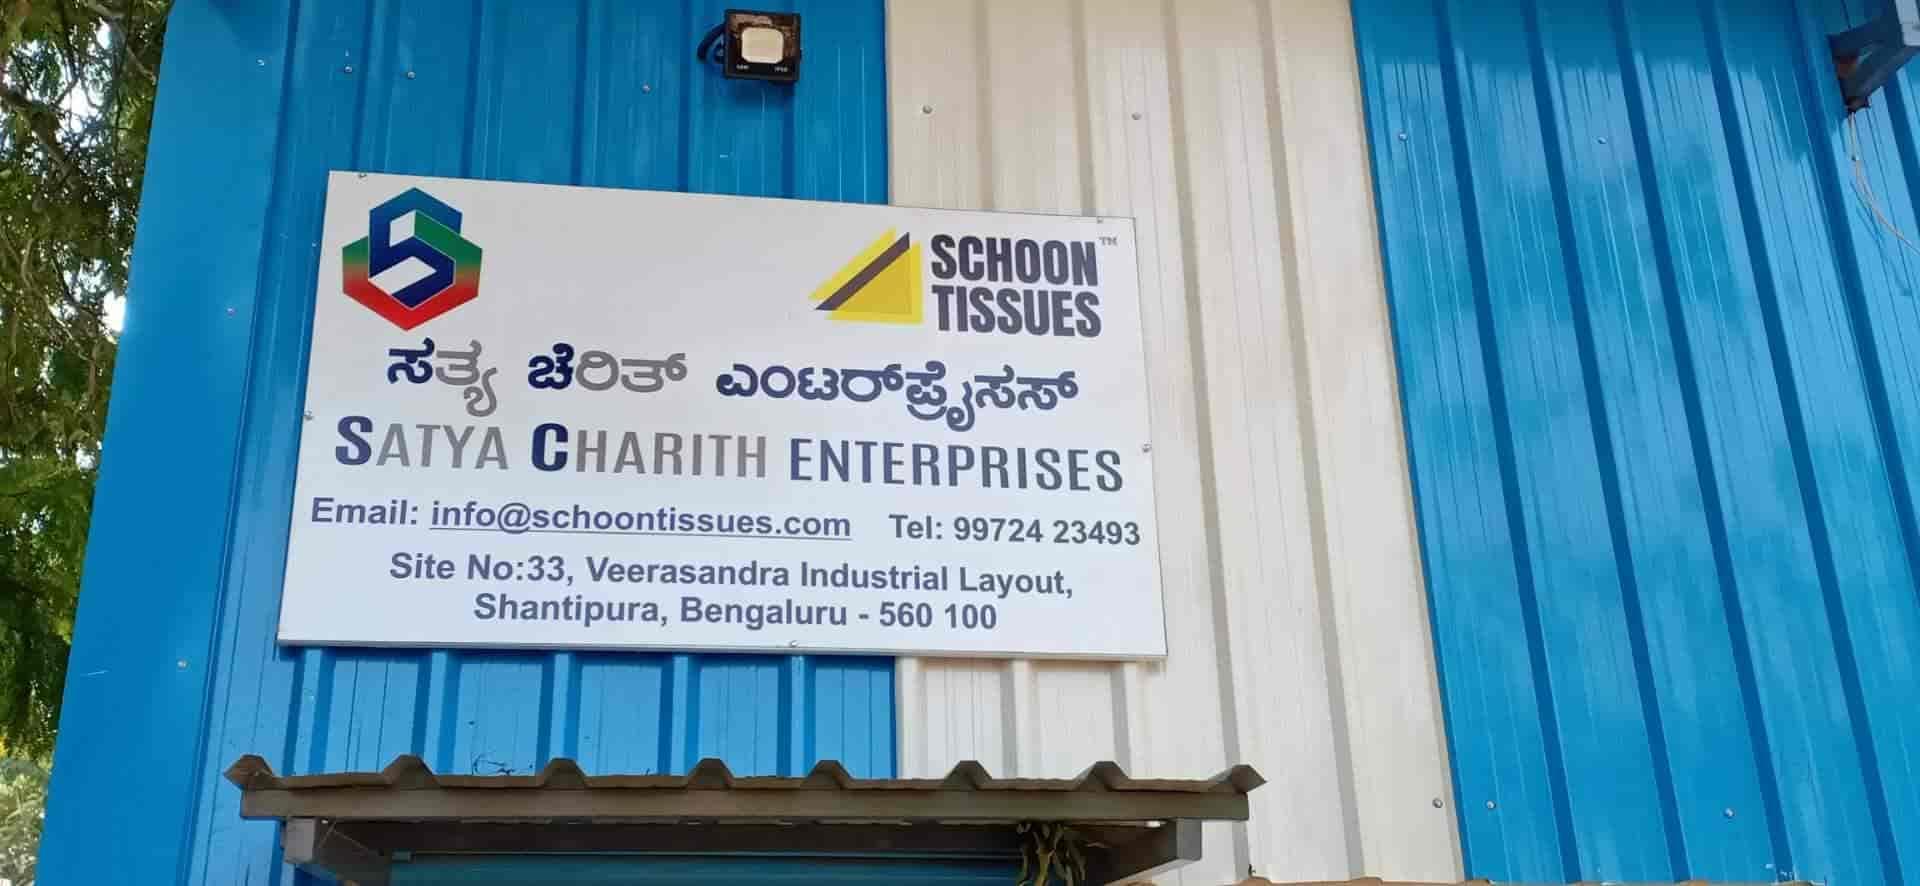 Satya Charith Enterprises, Electronic City Phase 2 - Tissue